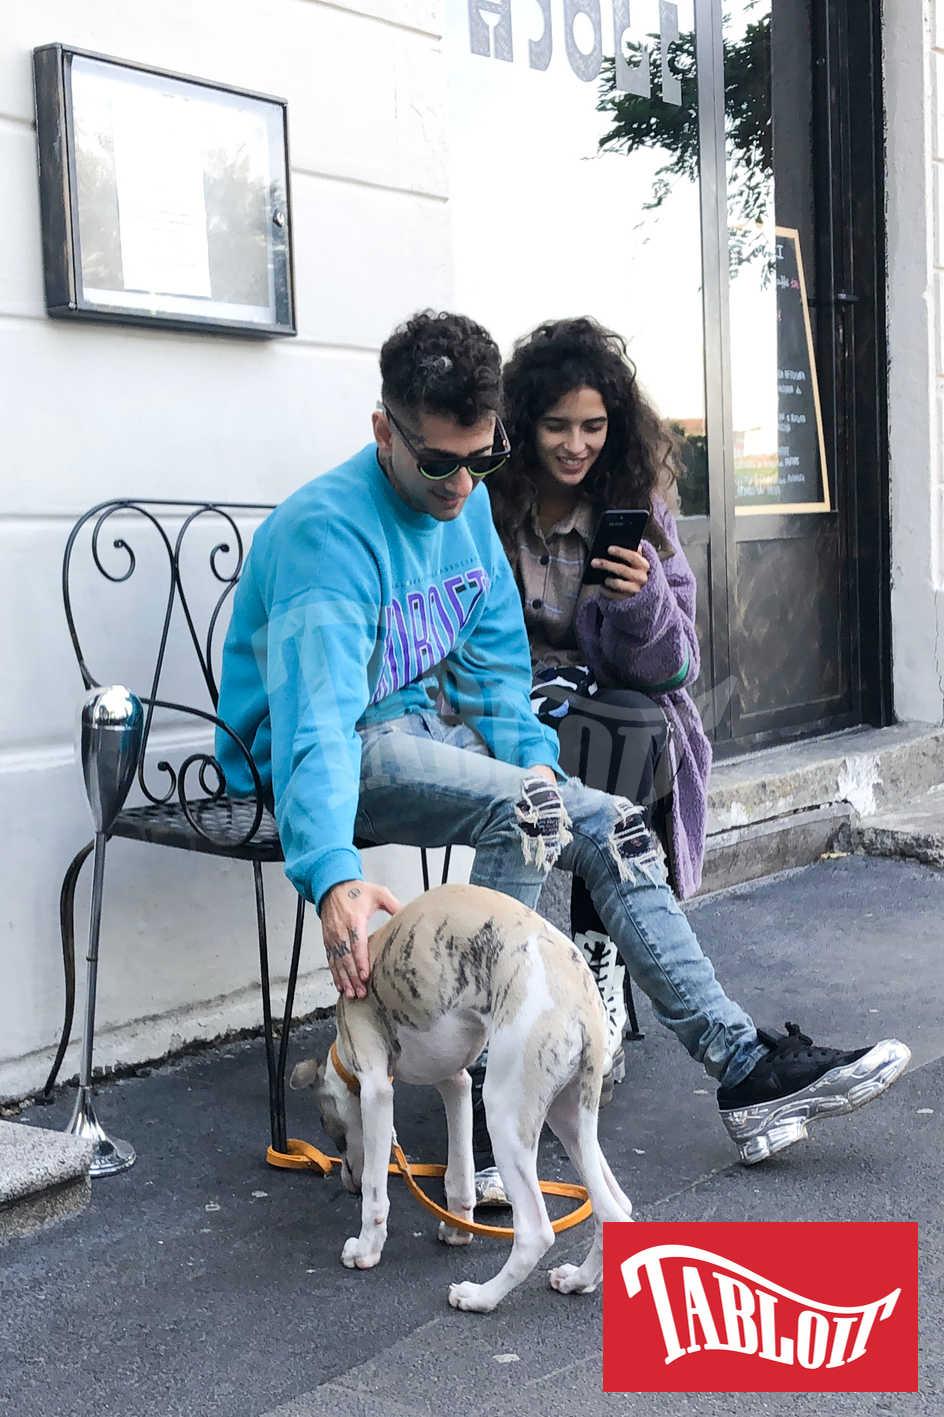 Chiara Scelsi e Wayne Santana a milano con il cane